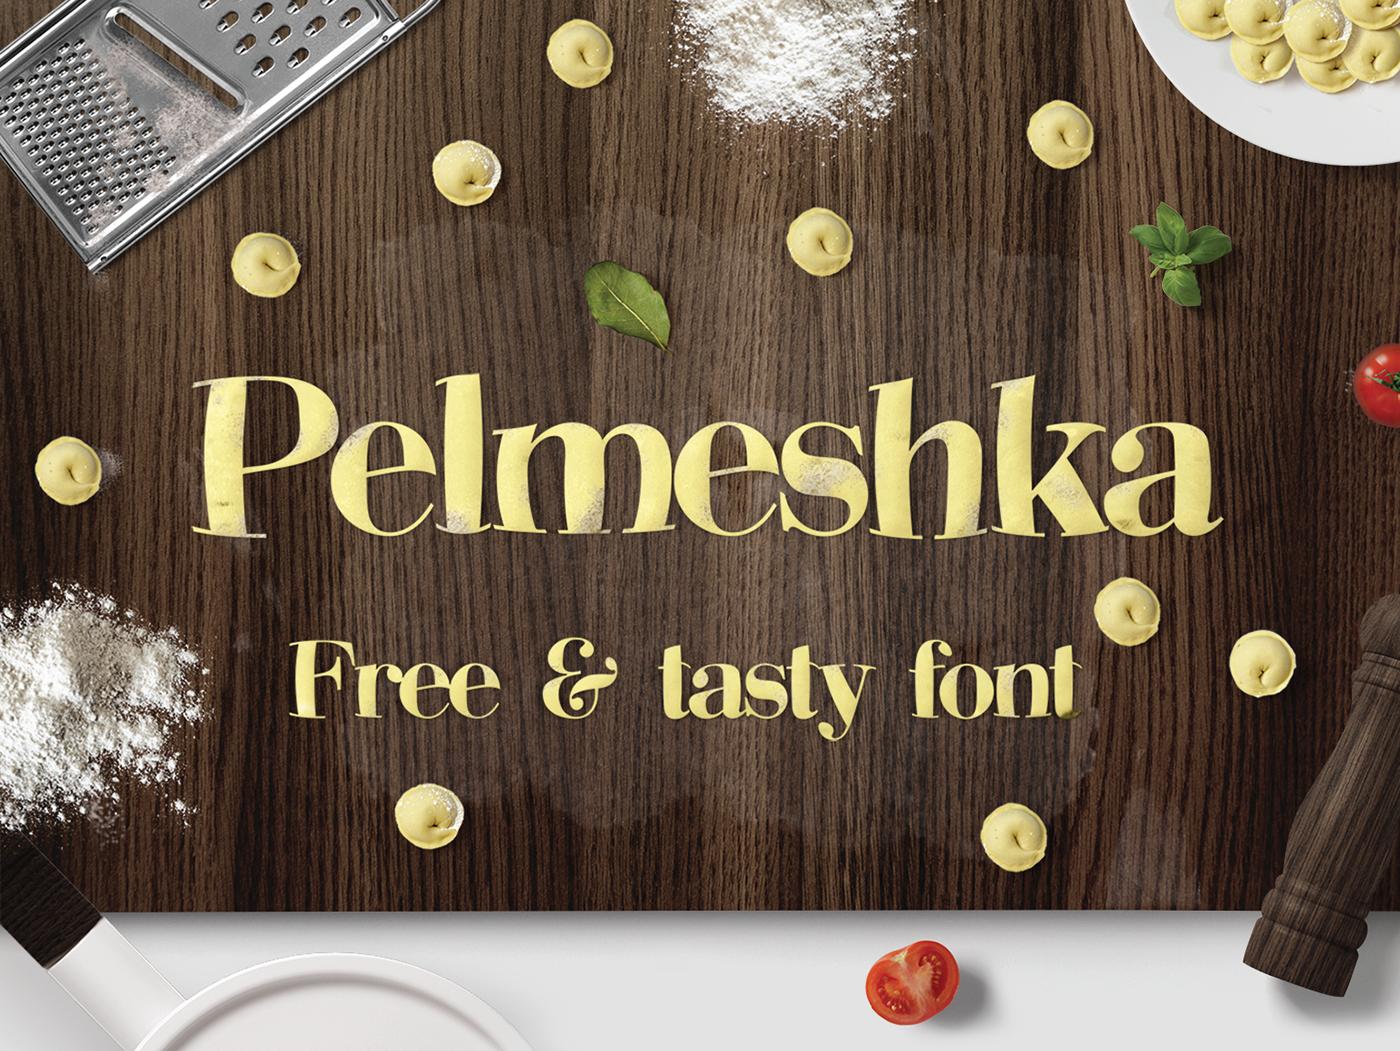 Pelmeshka – Free Funny Serif Font Poster A